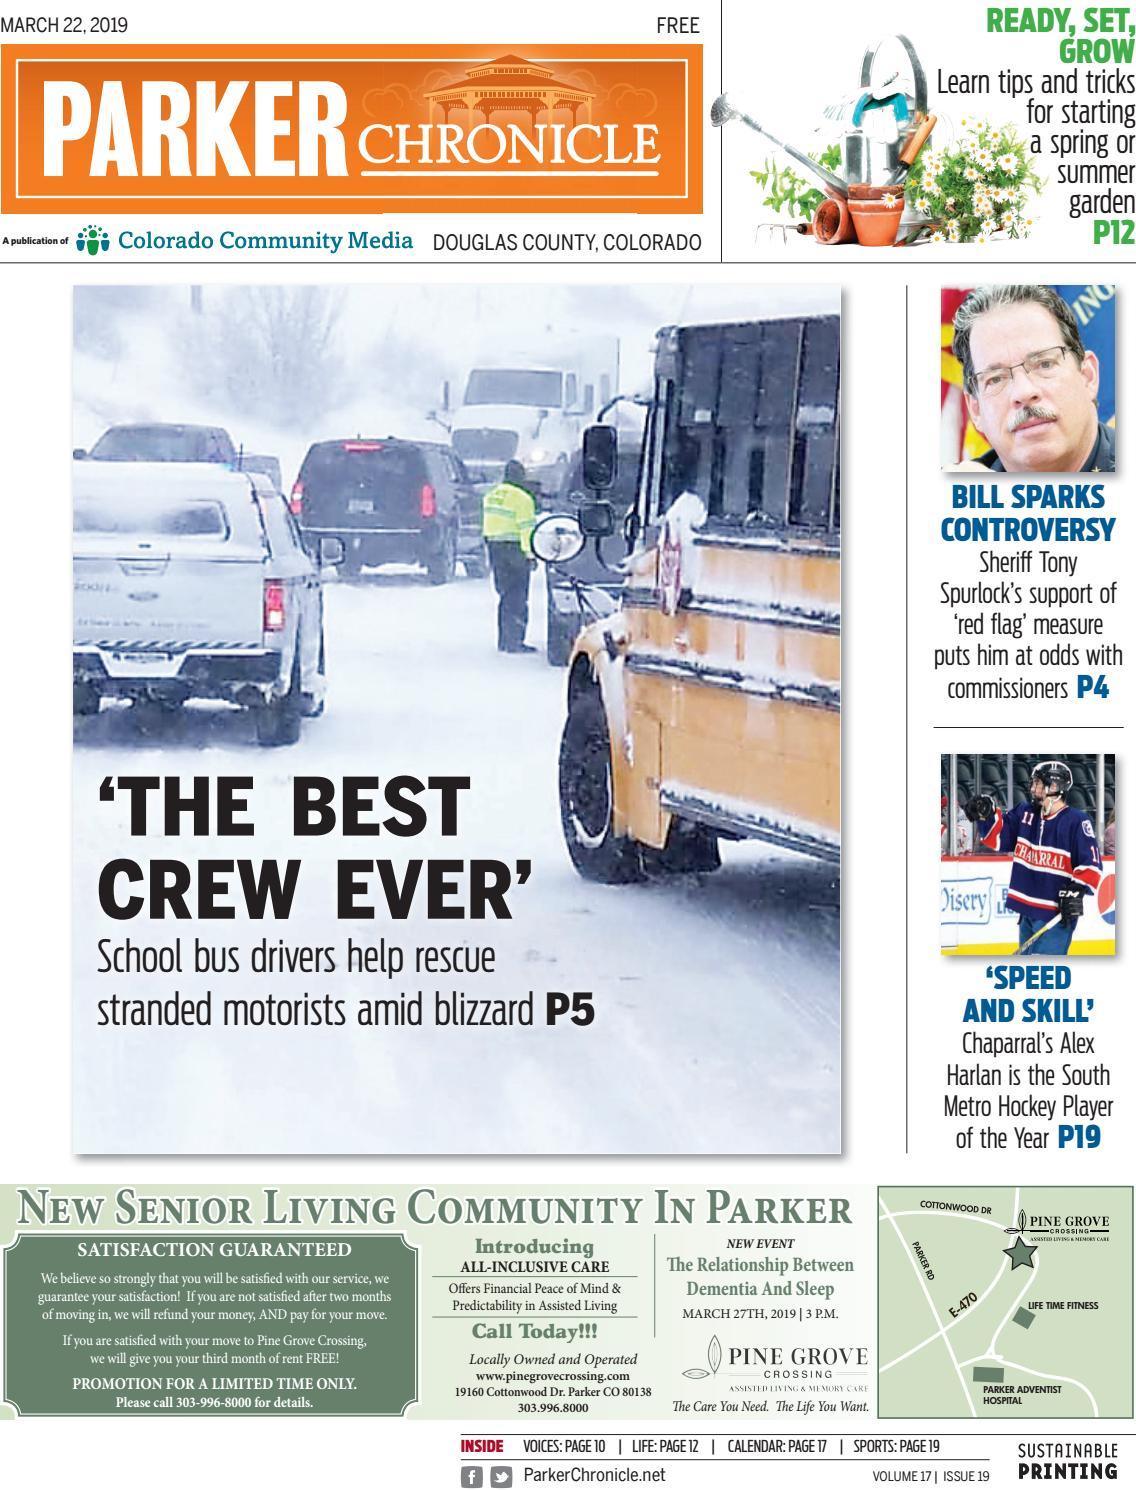 de1c627e0ff9 Parker Chronicle 0322 by Colorado Community Media - issuu